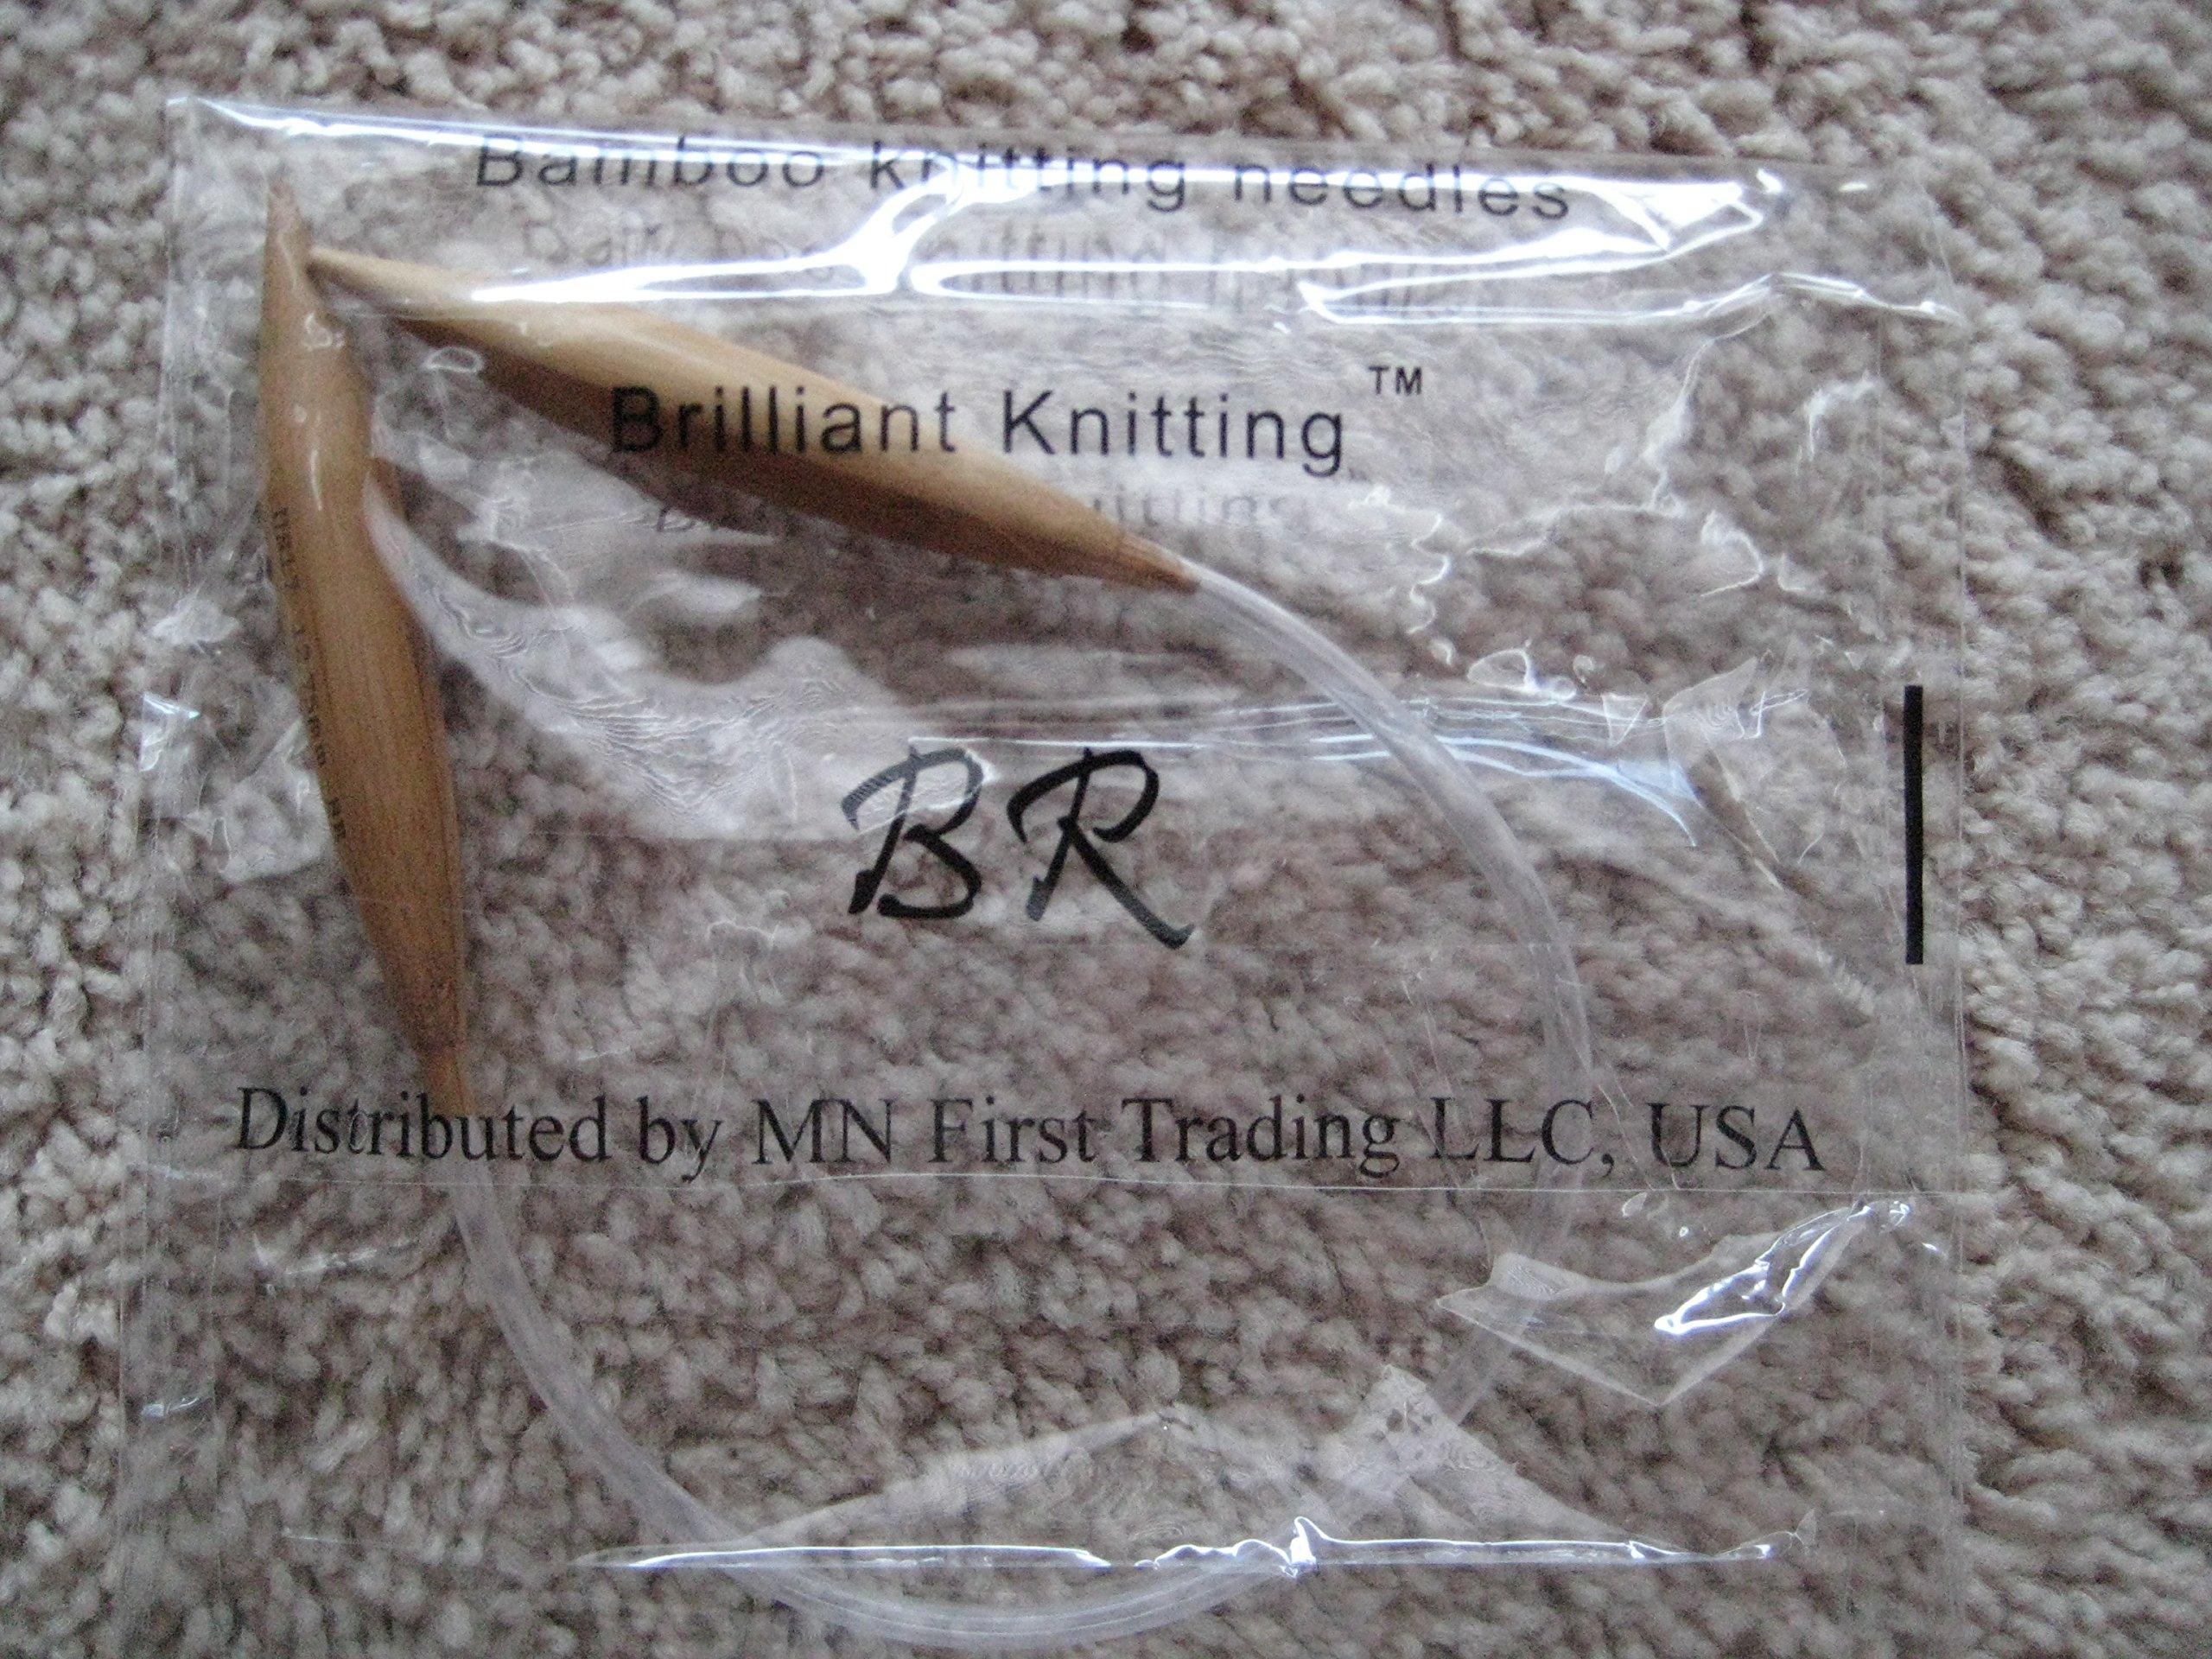 Big size, 3 sizes 9'' inches Bamboo Circular Knitting Needles BrilliantKnitting (BR brand) (US 10.5, 11, 13)New USA made tubing, never break again